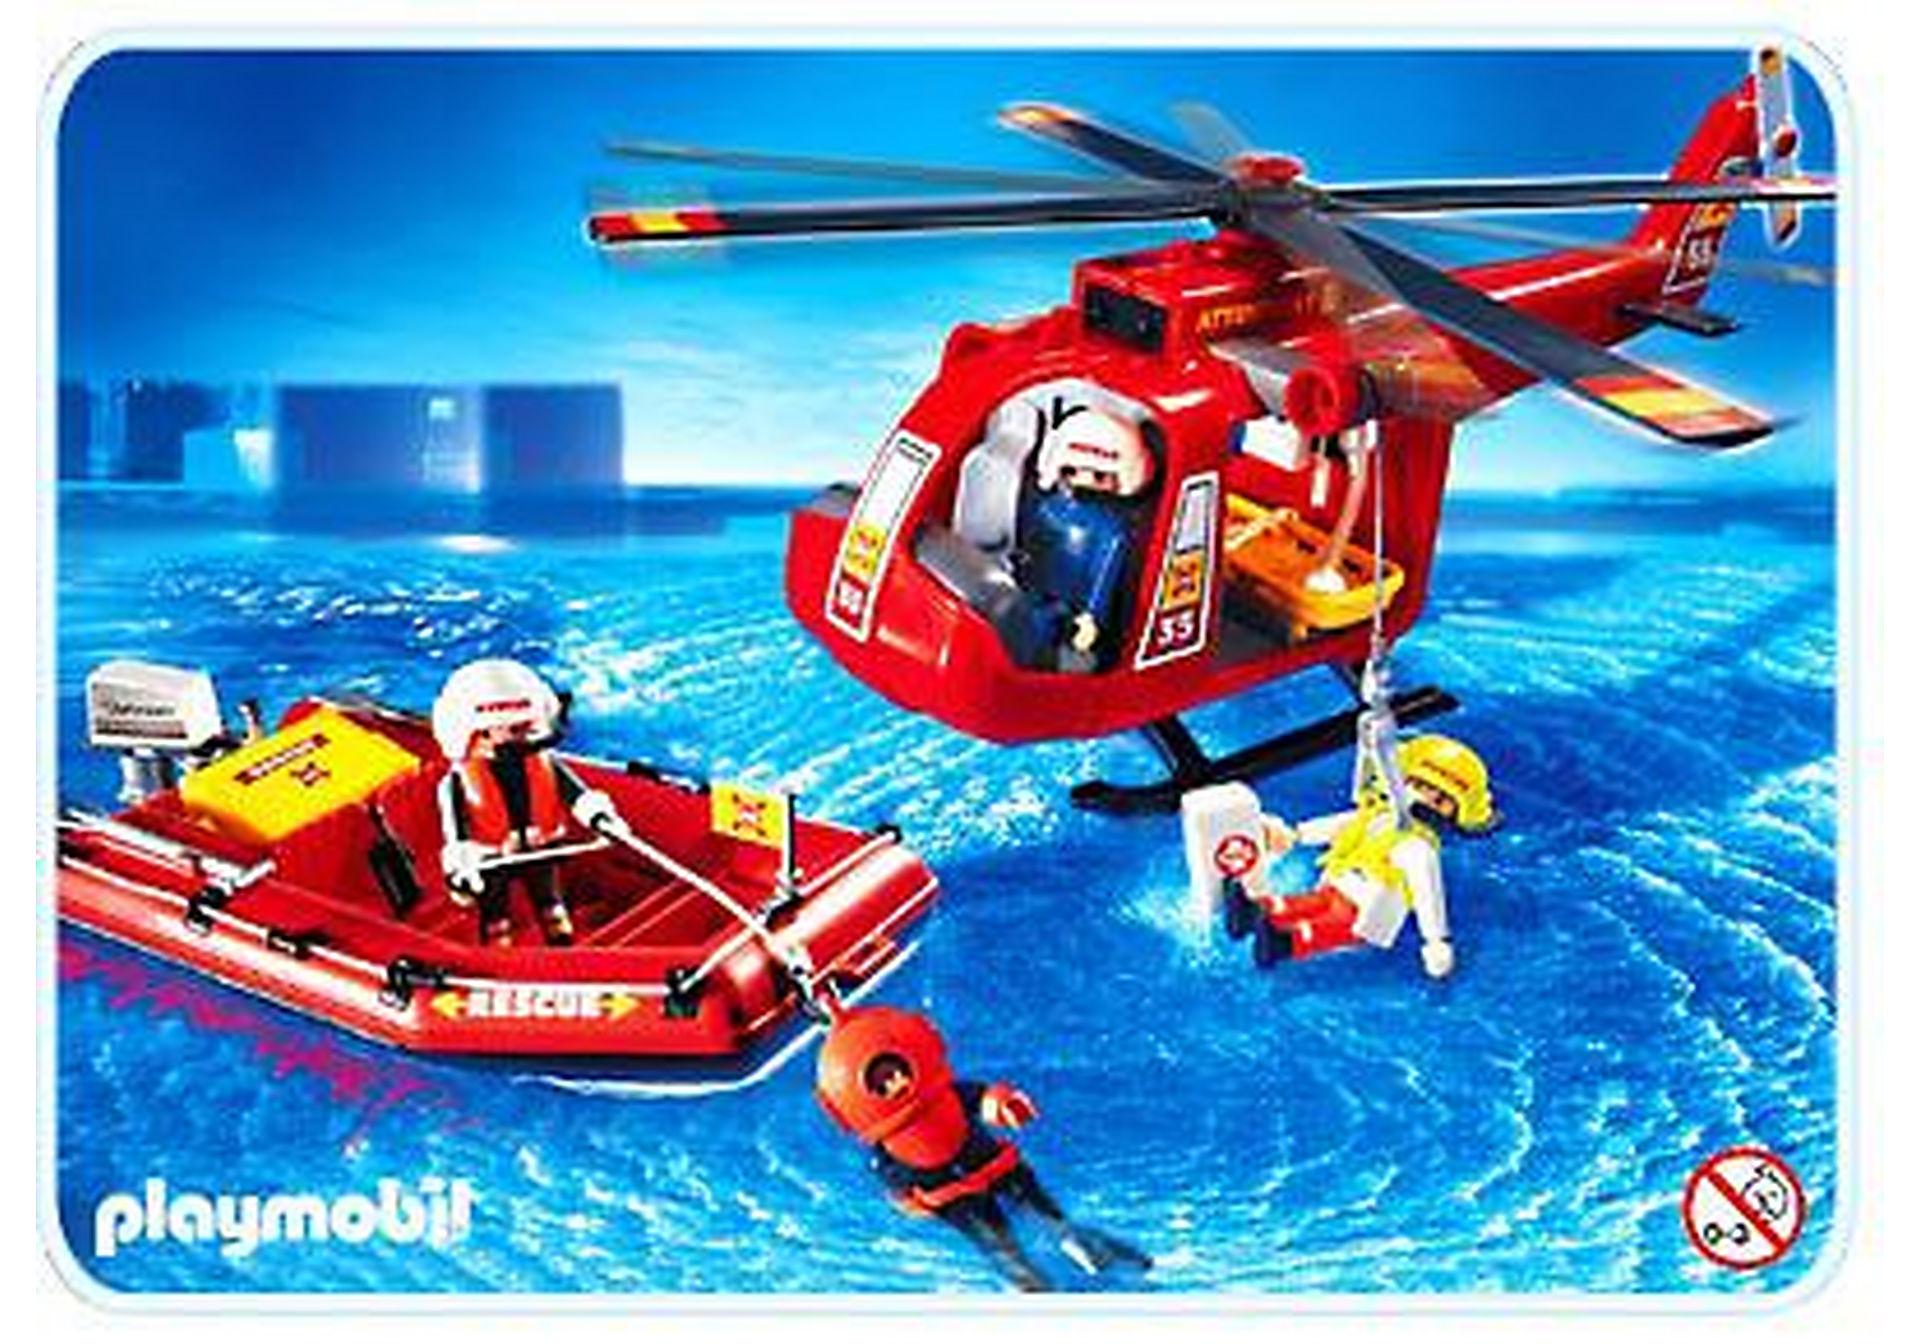 4428-A SOS-Helikopter/Rettungsboot zoom image1